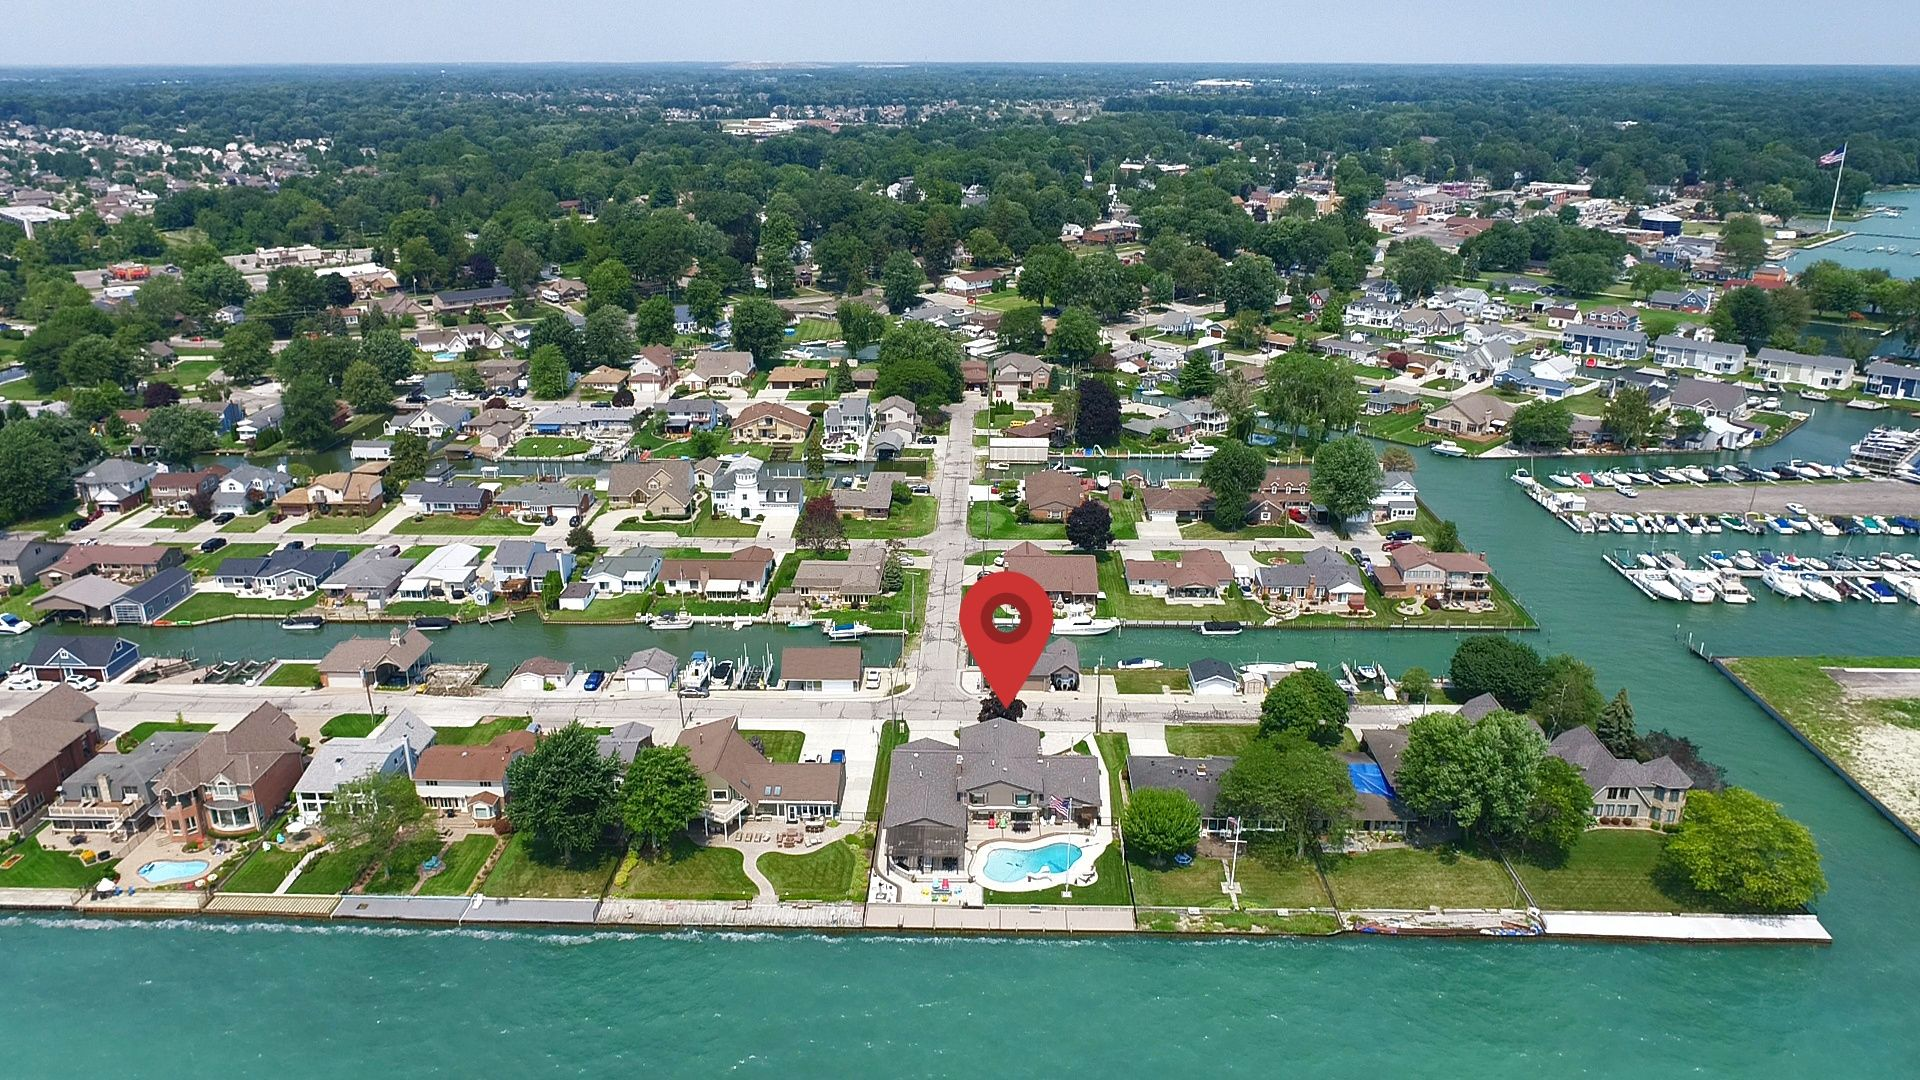 35800 Koenig St, New Baltimore, MI 48047, USA Photo 9